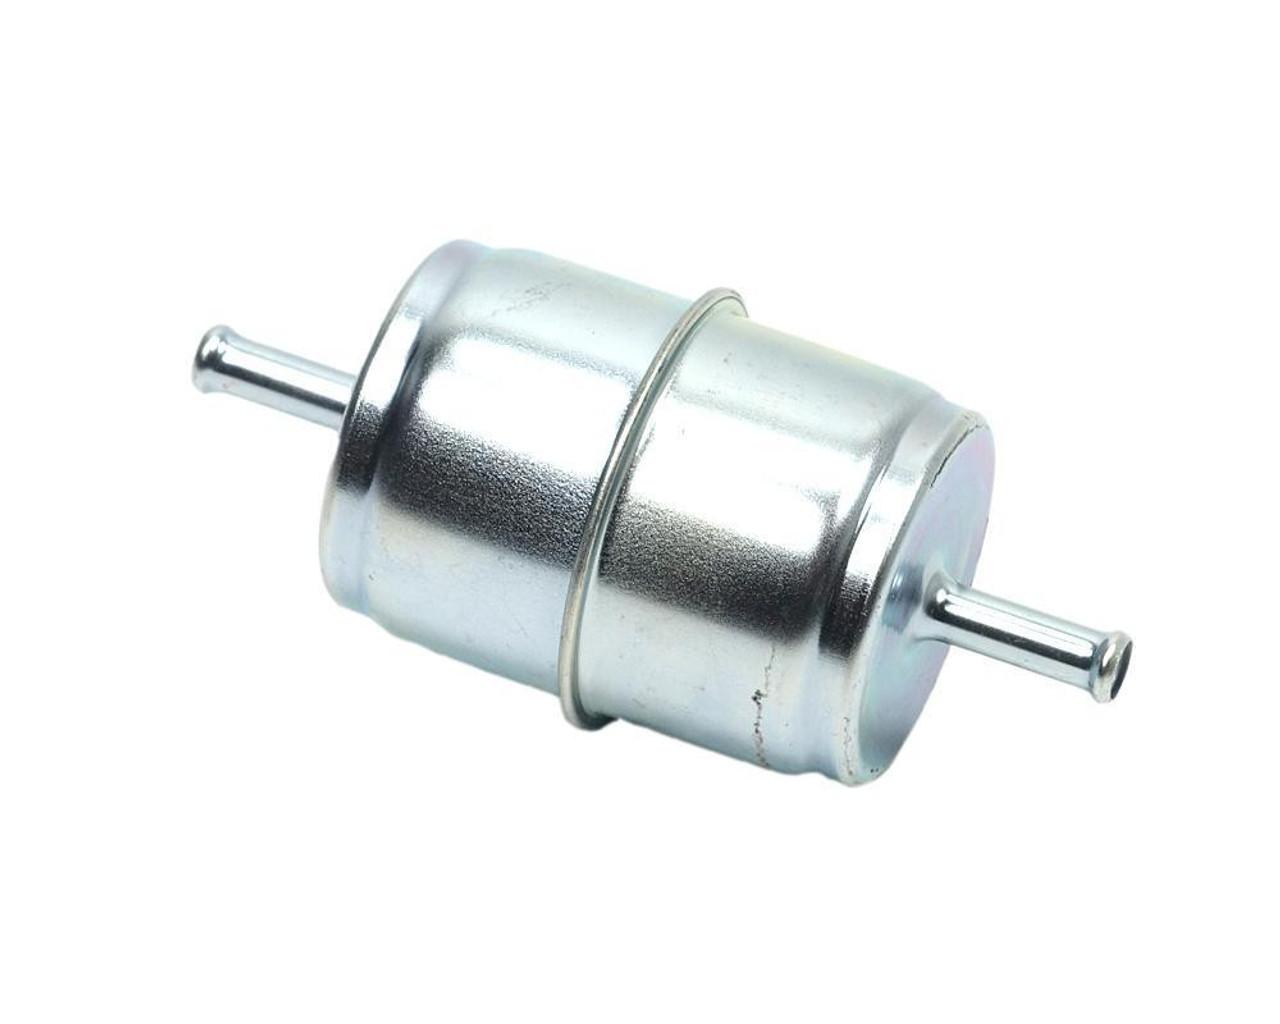 Fuel Filter - Carbureted - Metal